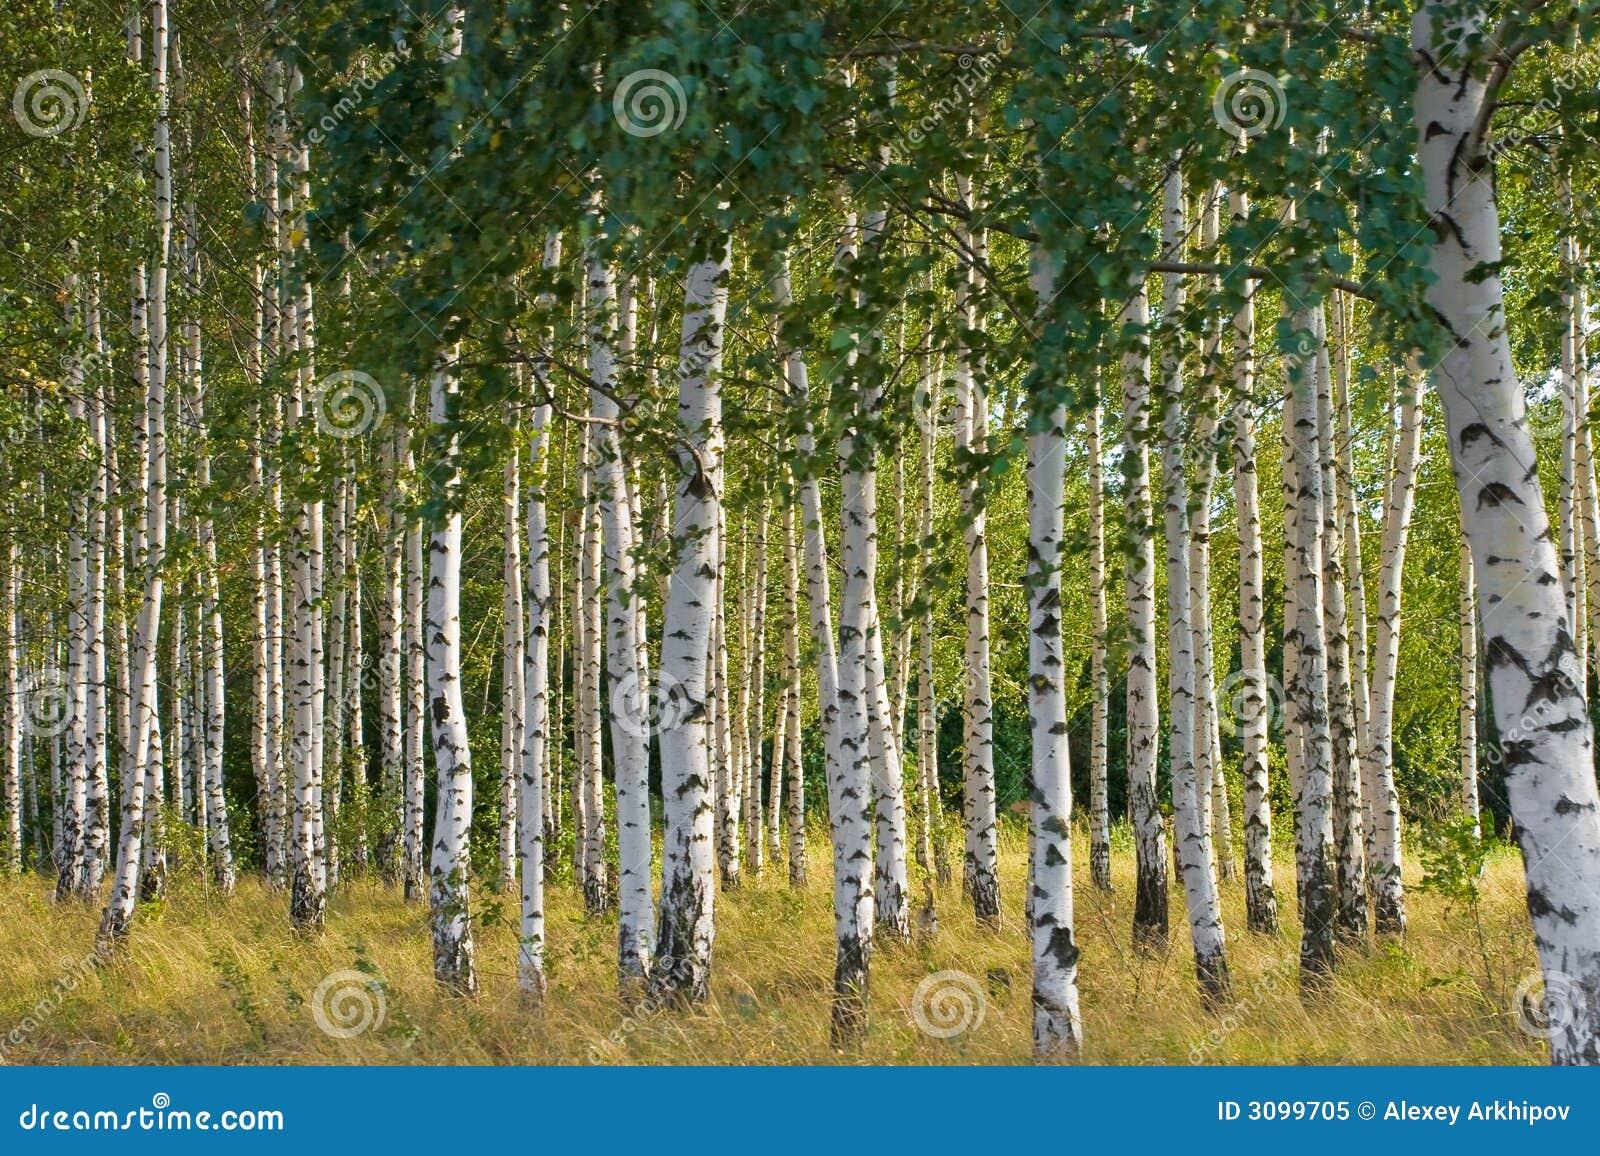 Дерево бруски для рукоятей стабилизированное дерево